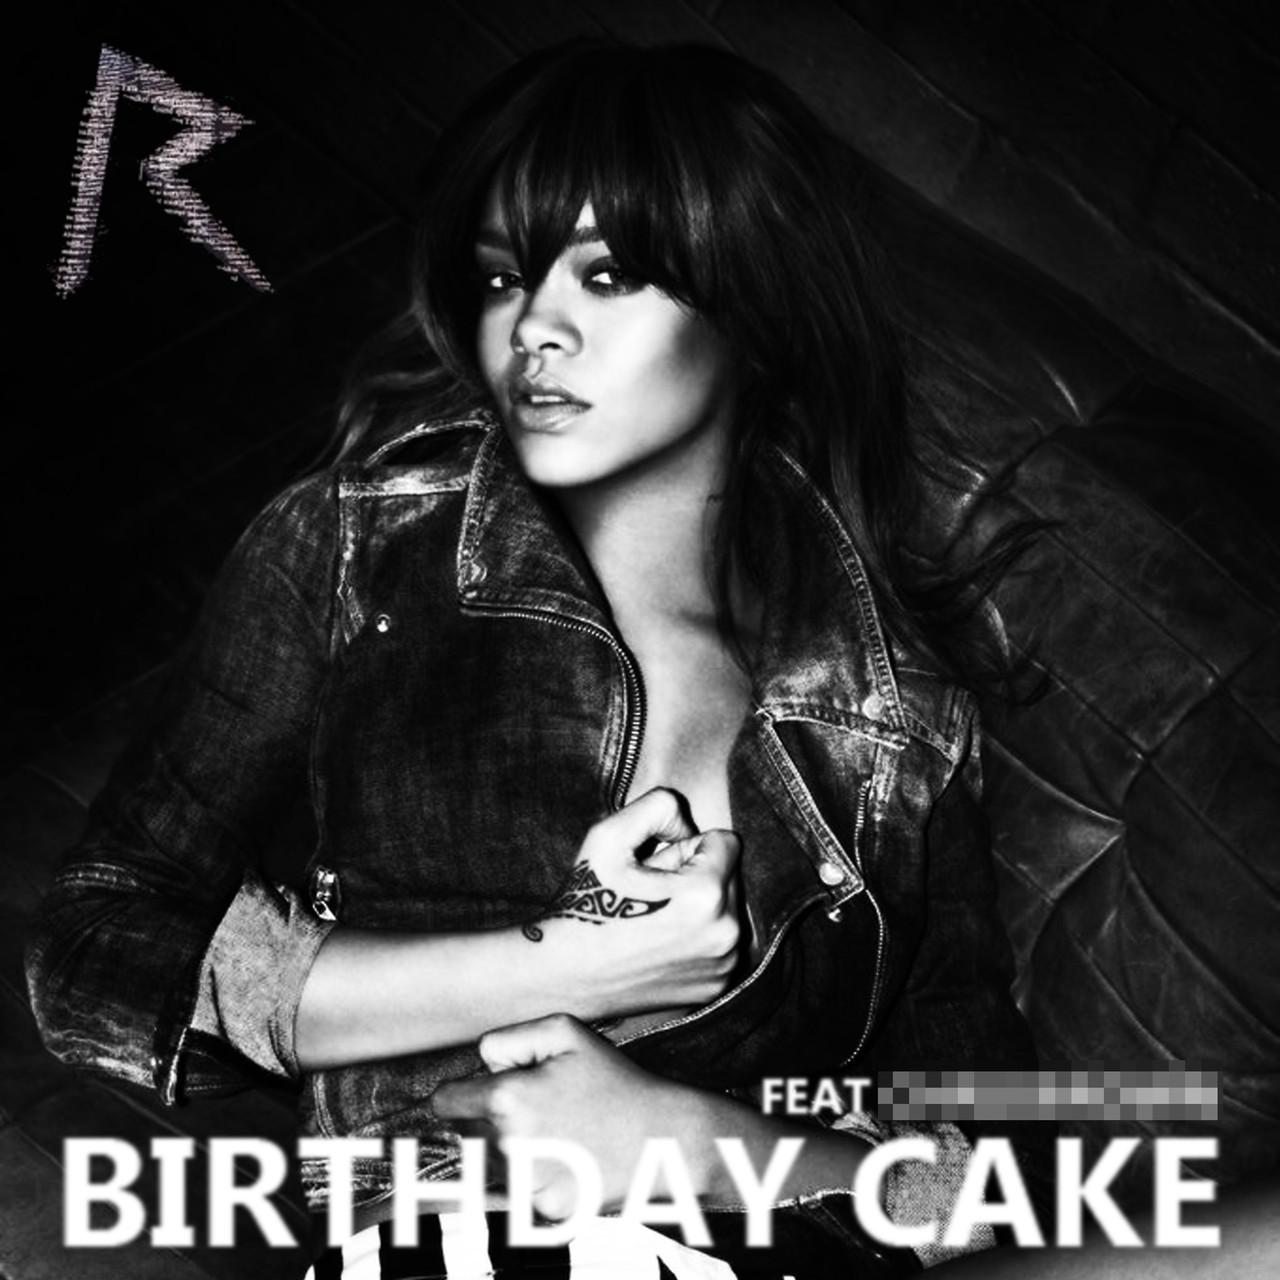 Best ideas about Rihanna Birthday Cake . Save or Pin BIRTHDAY CAKE RIHANNA Fomanda Gasa Now.